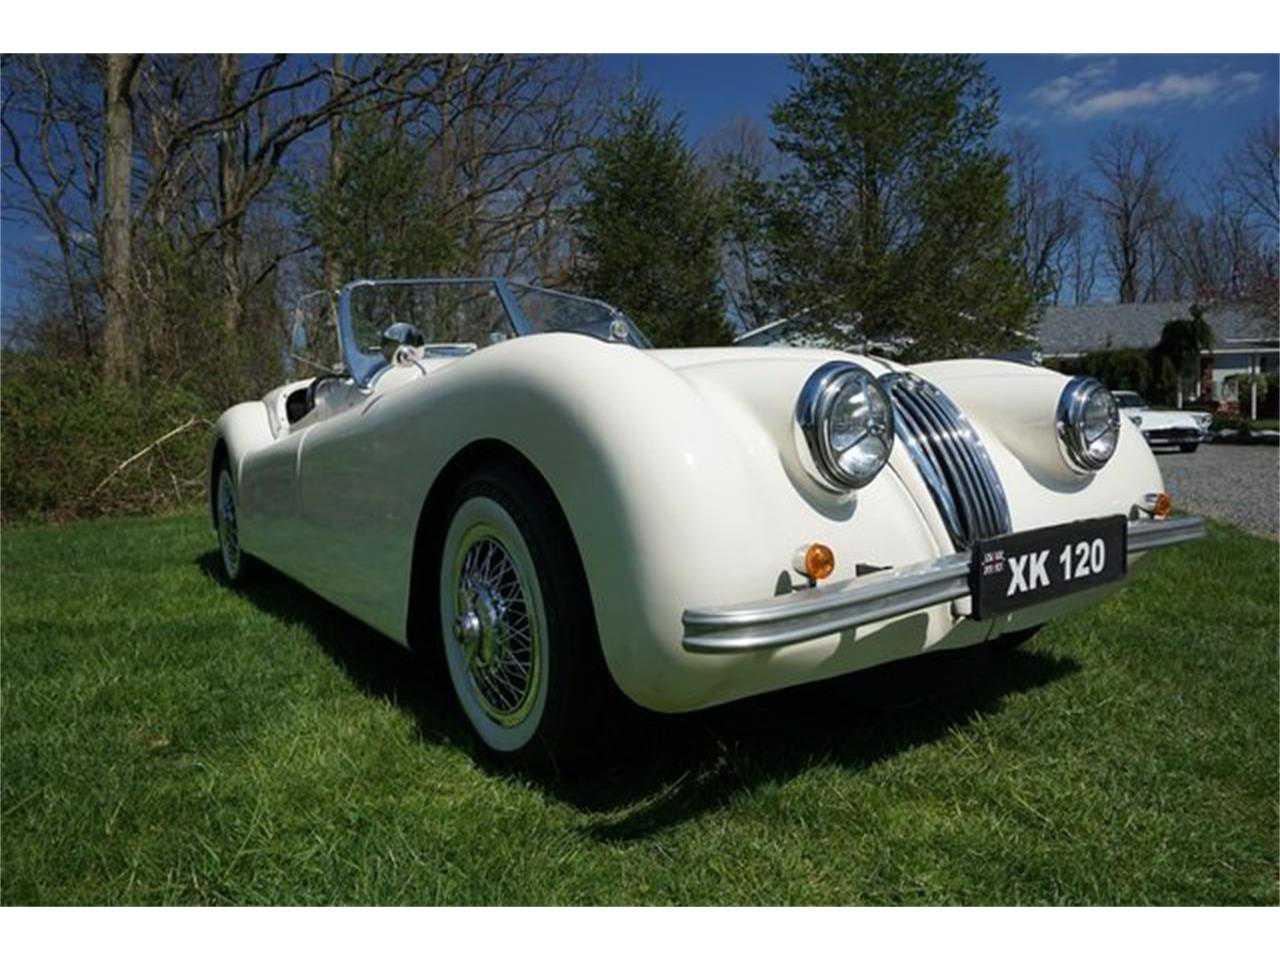 1956 Jaguar Replica Kit Car For Sale In Monroe Nj Asn48670del Xk150 Wiring Harness